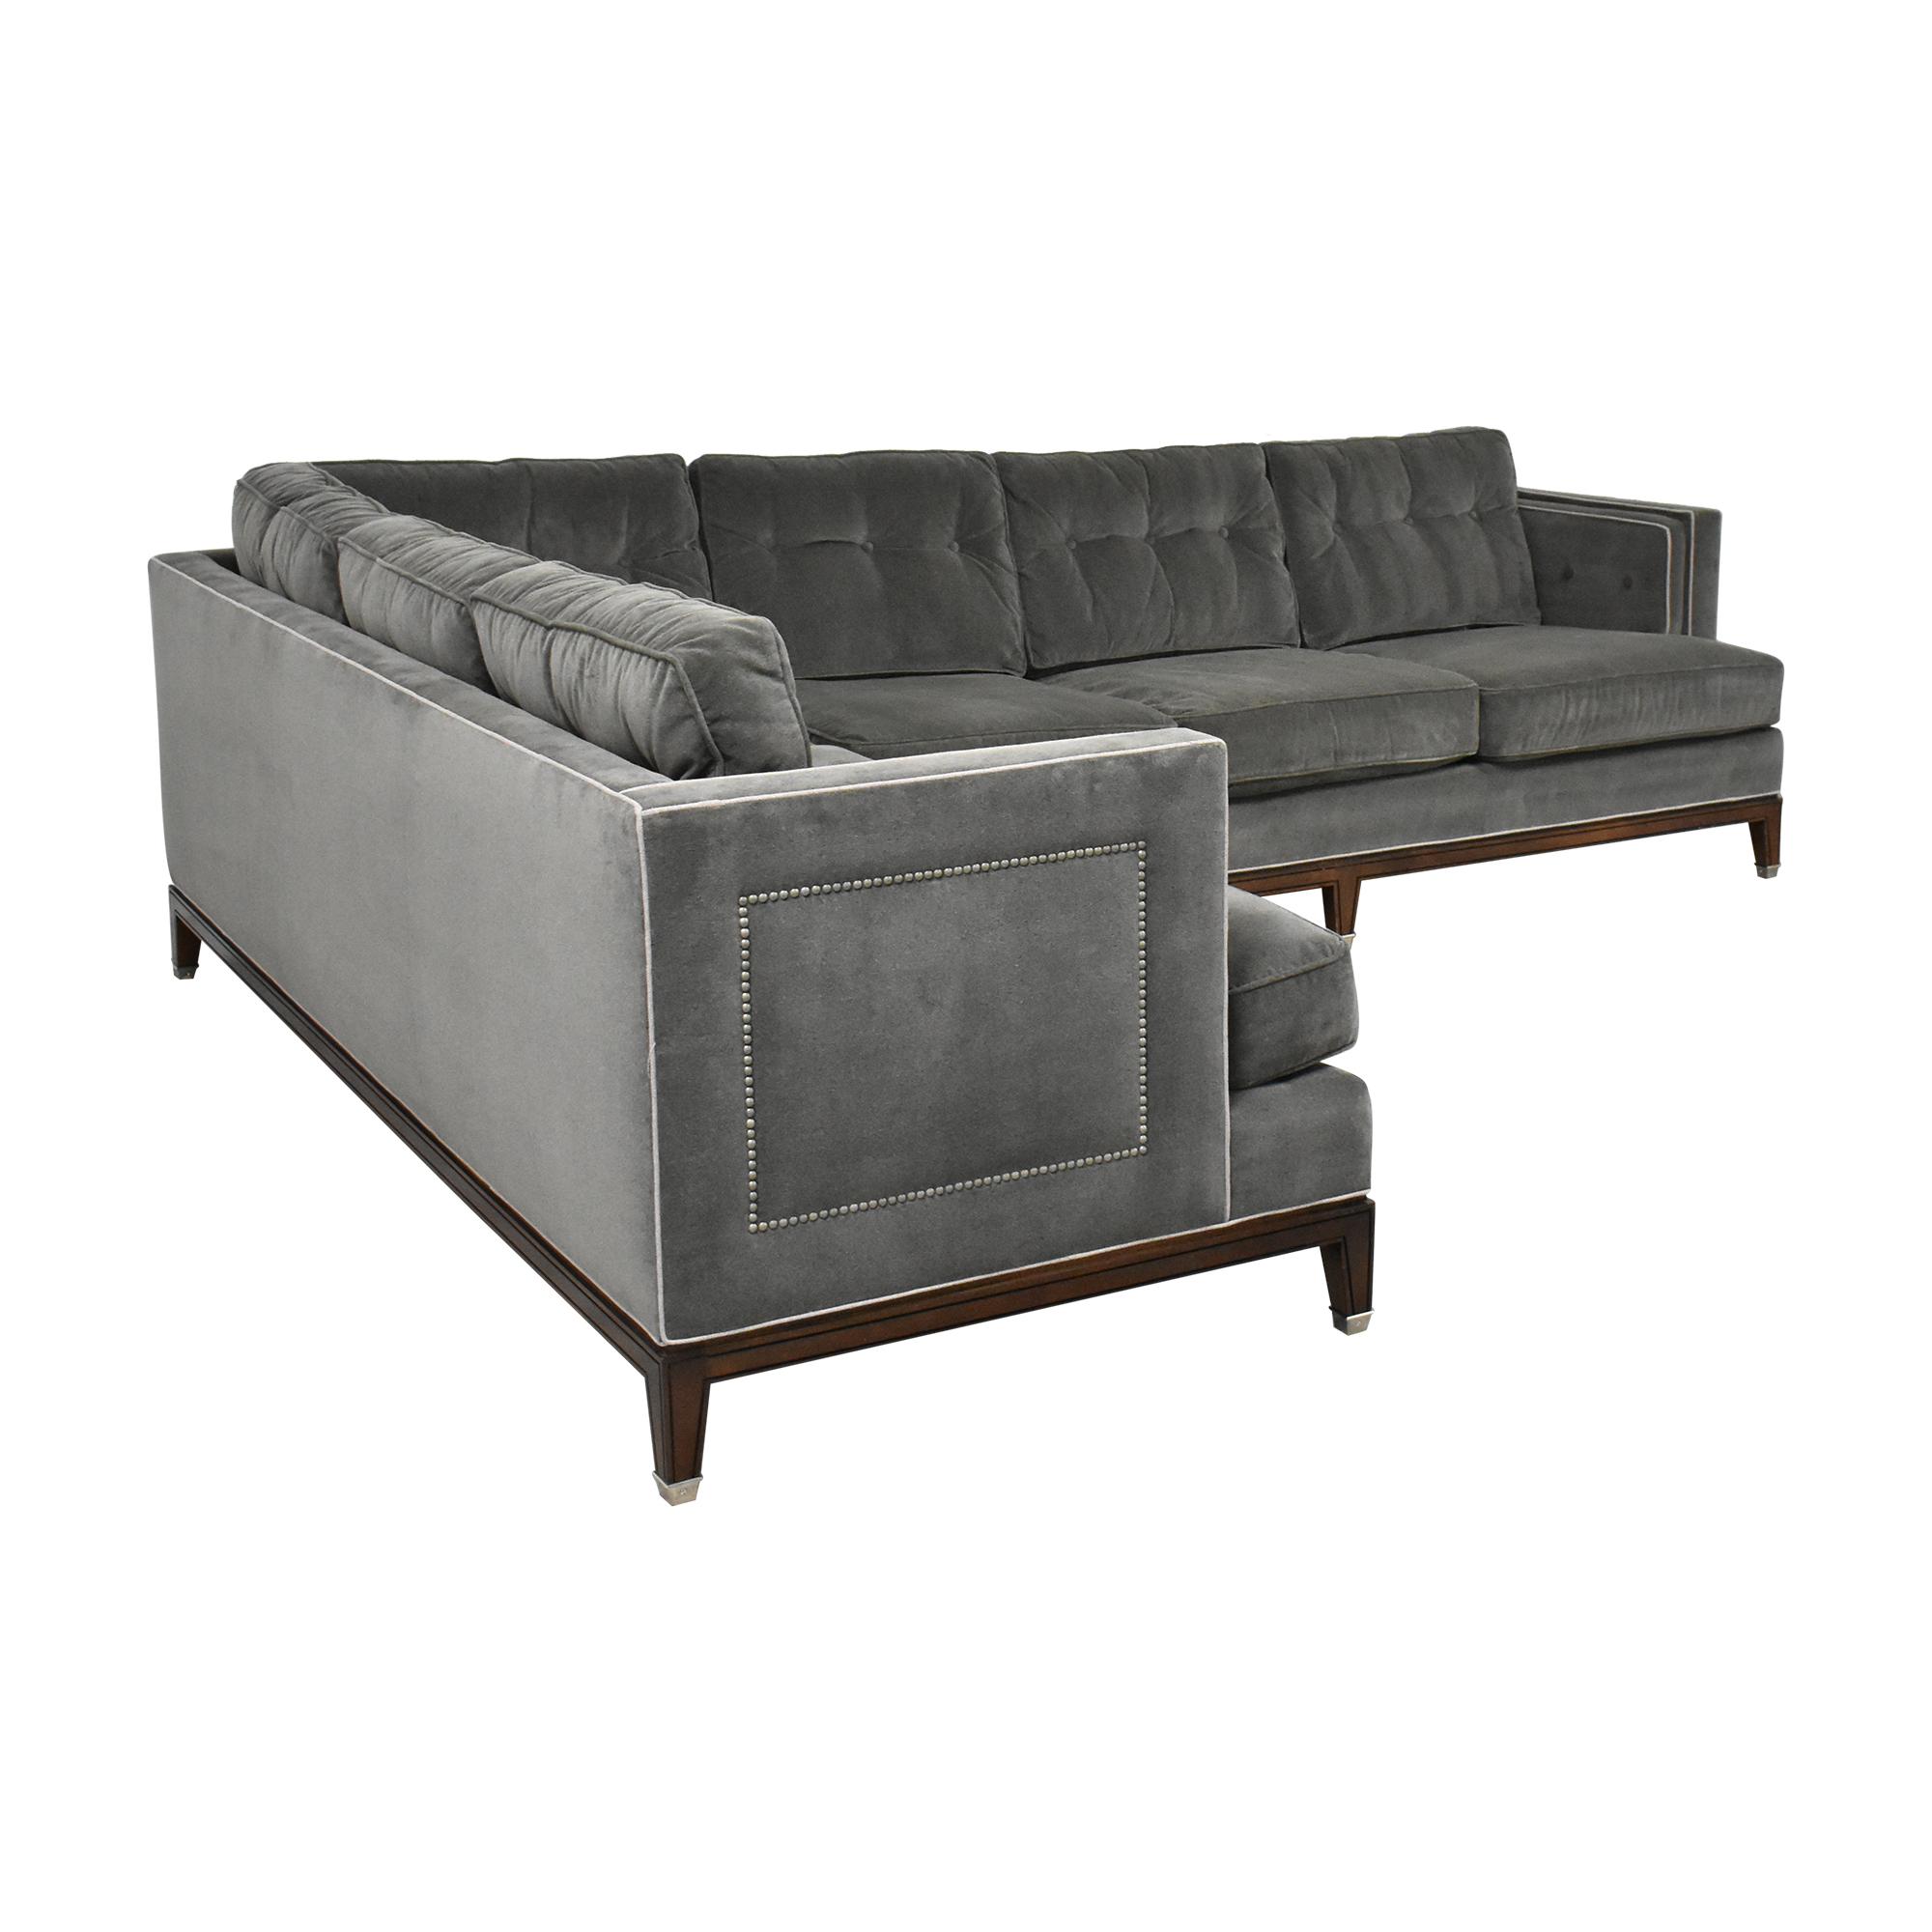 Vanguard Furniture Vanguard  Furniture Whitaker Sectional Sofa discount